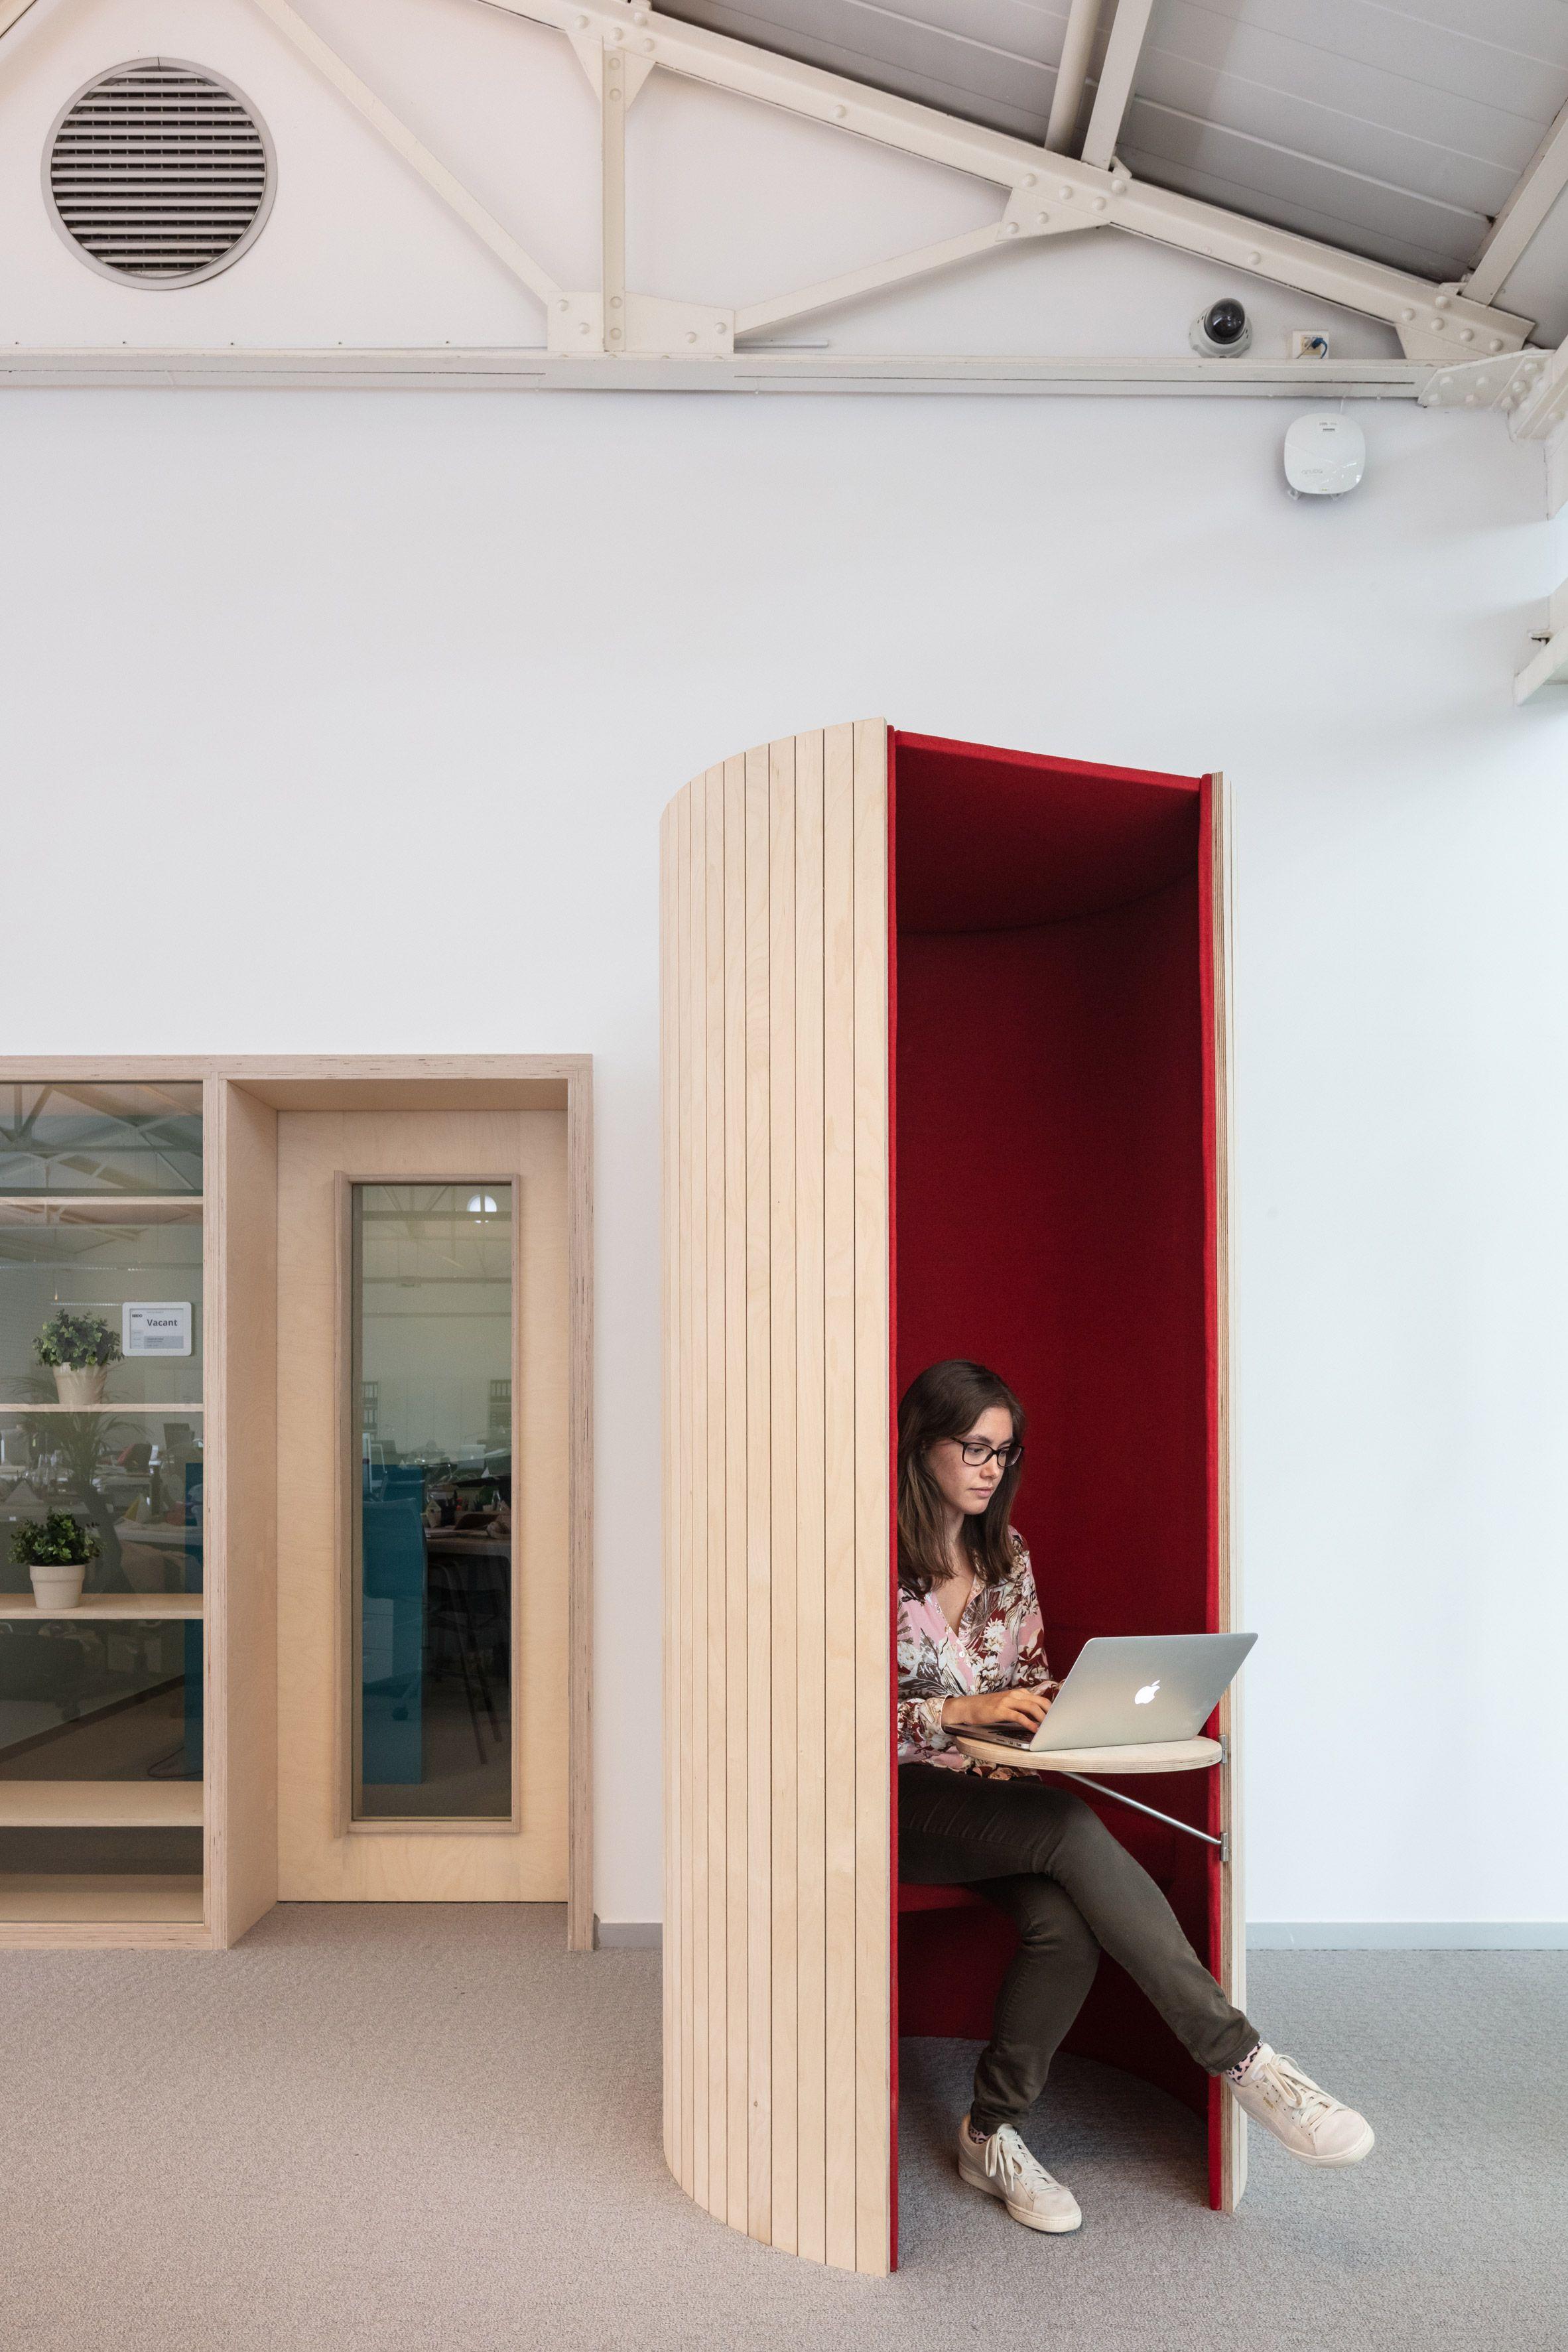 Zampone Creates Bbdo Office In Century Old Wine Warehouse In Brussels Architecture Today Bbdo Interior Design Boards